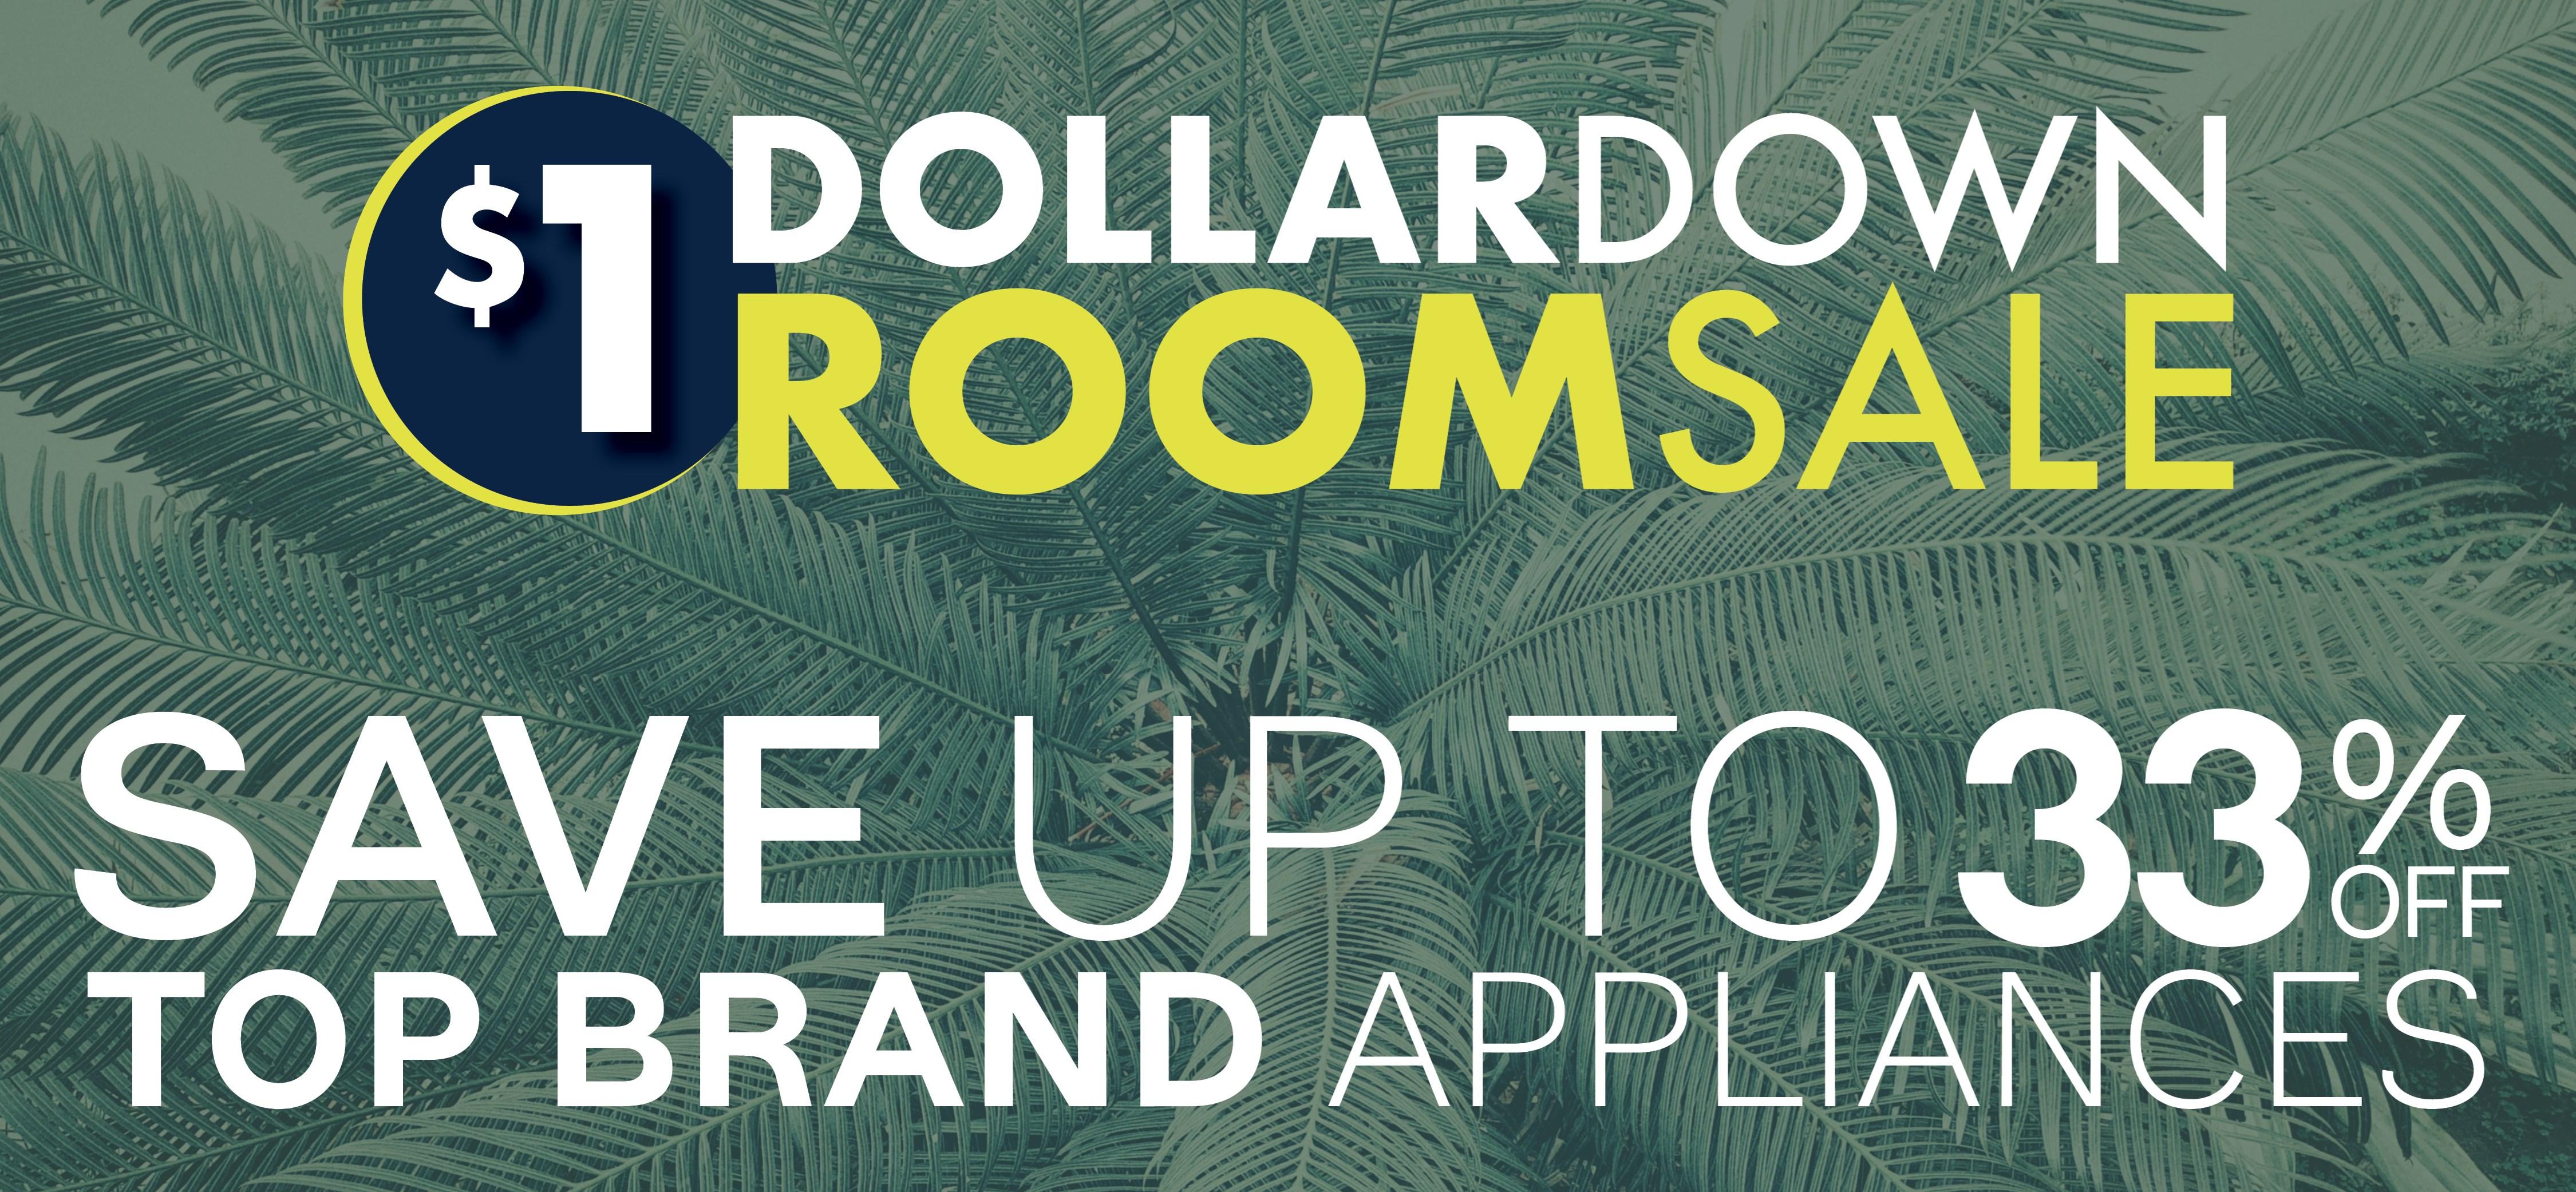 Furniture & ApplianceMart Dollar Down Room Sale